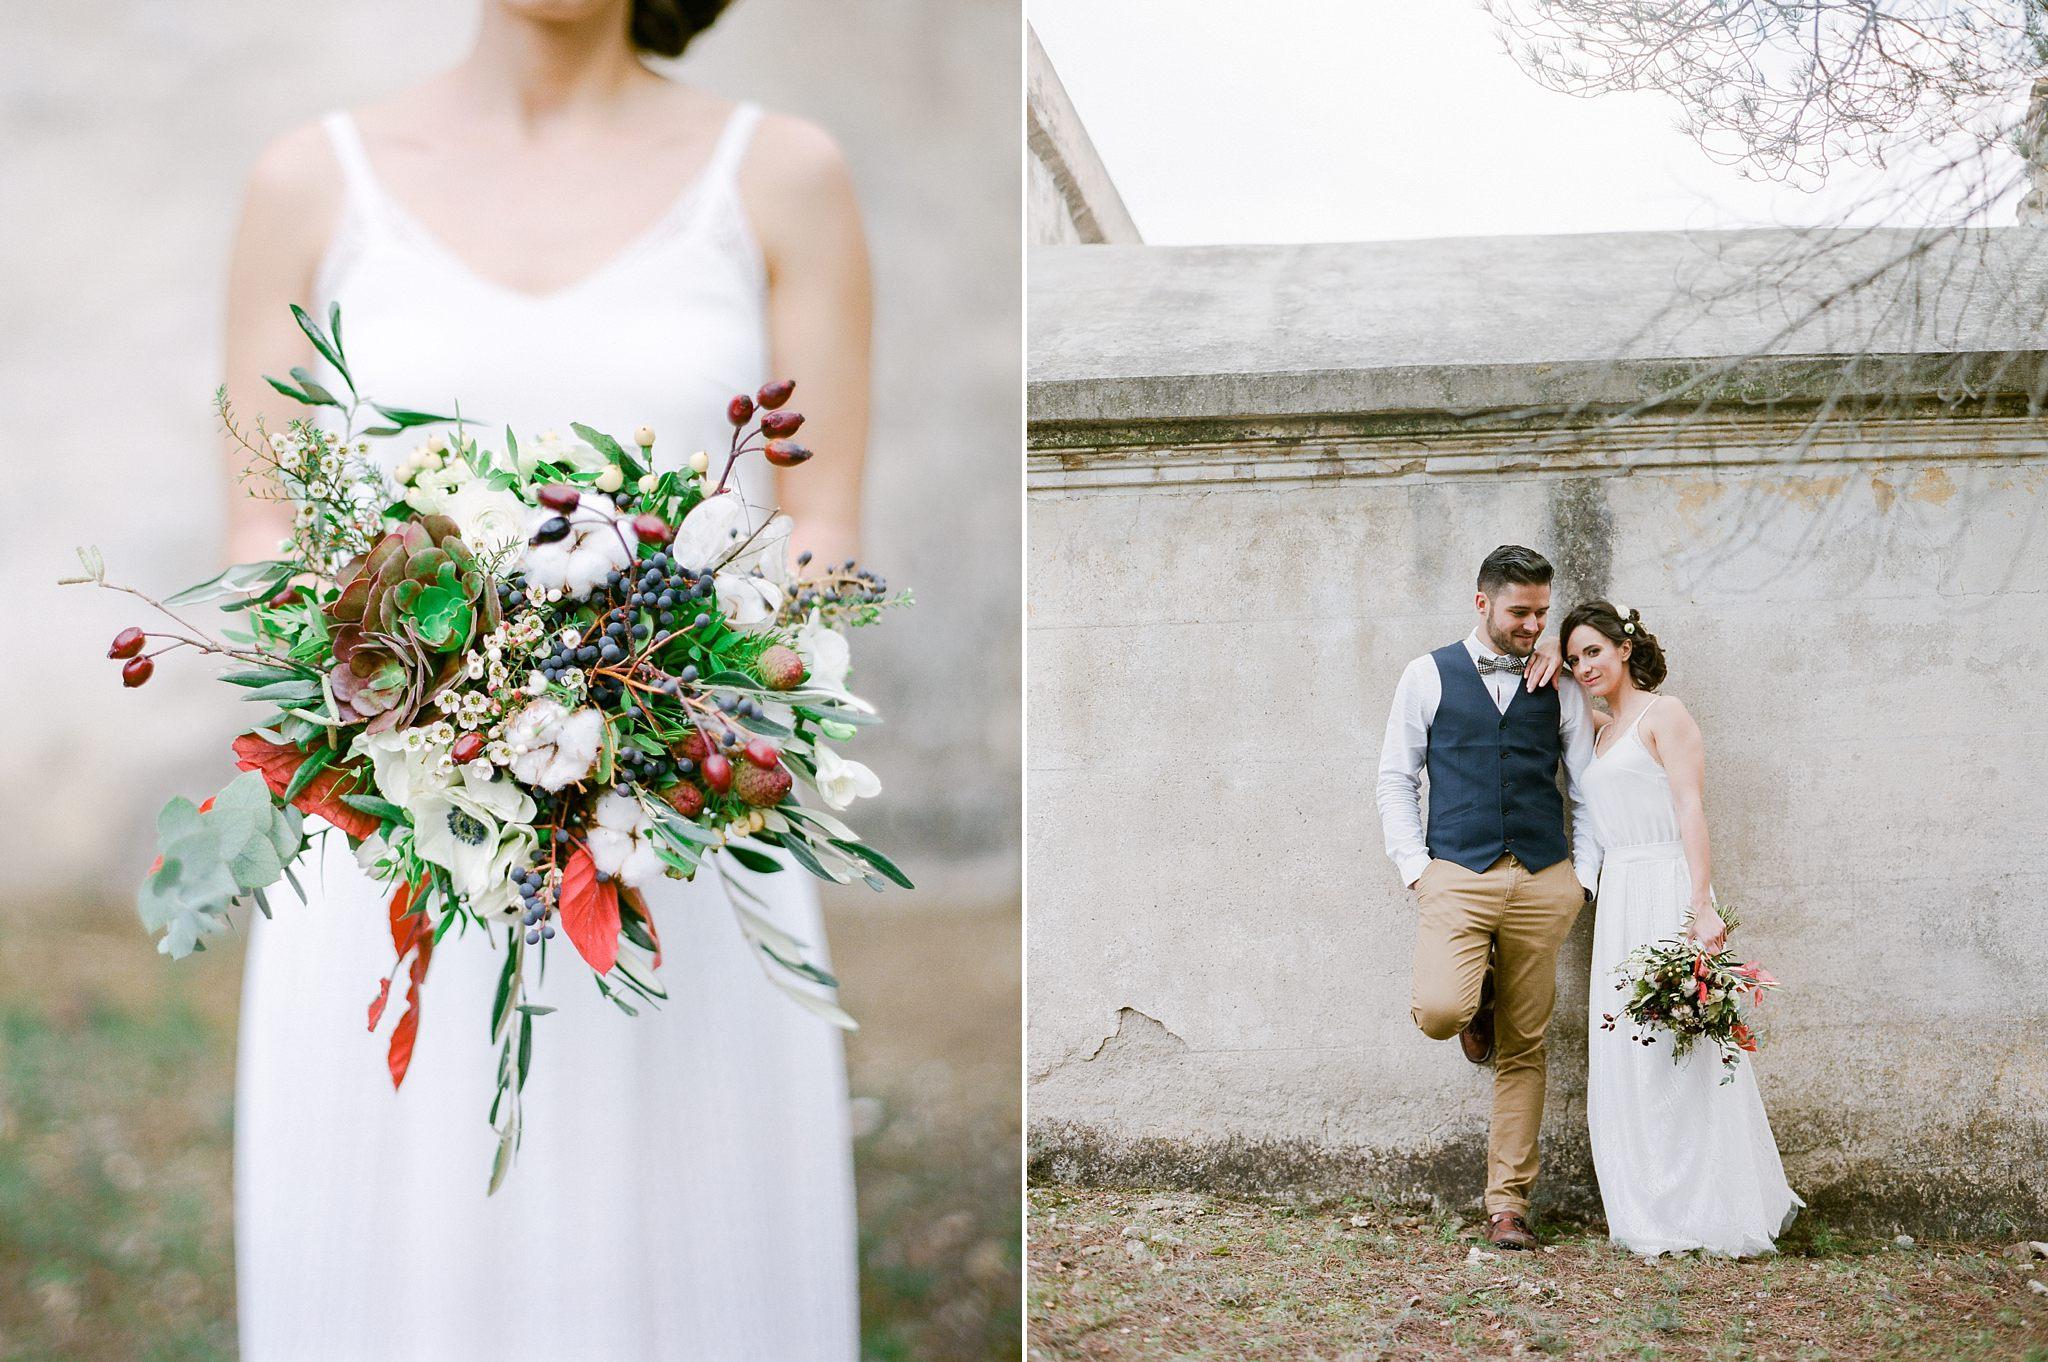 Mariage-a-la-maison-secall-hugo-hennequin-photographe-mariage-perpignan_0123.jpg